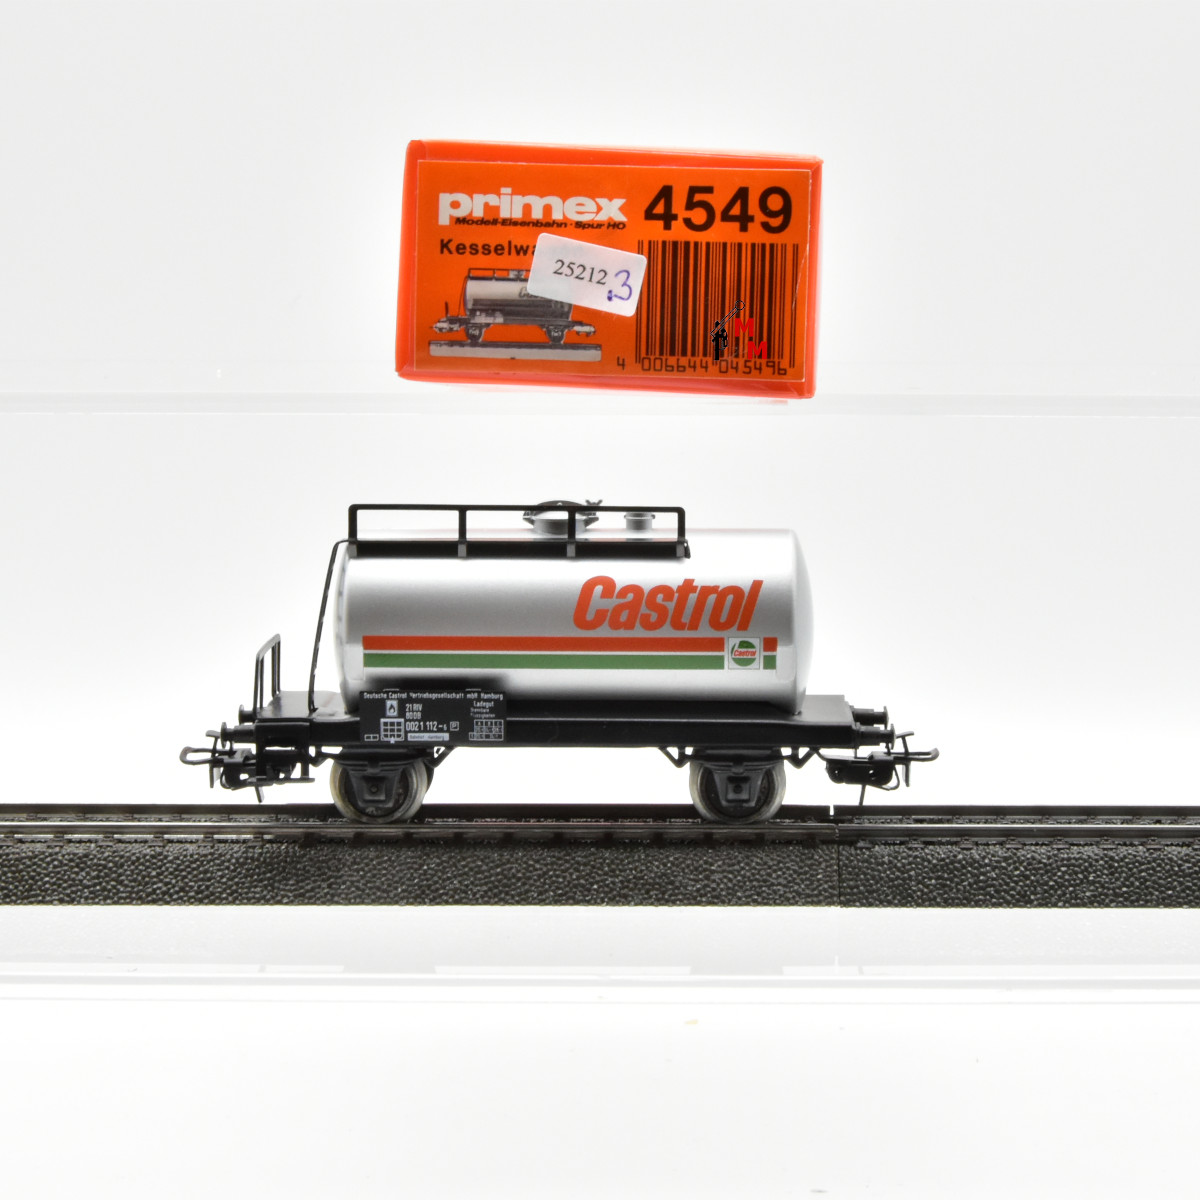 "Primex 4549.3 Kesselwagen ""Castrol"", (25212)"